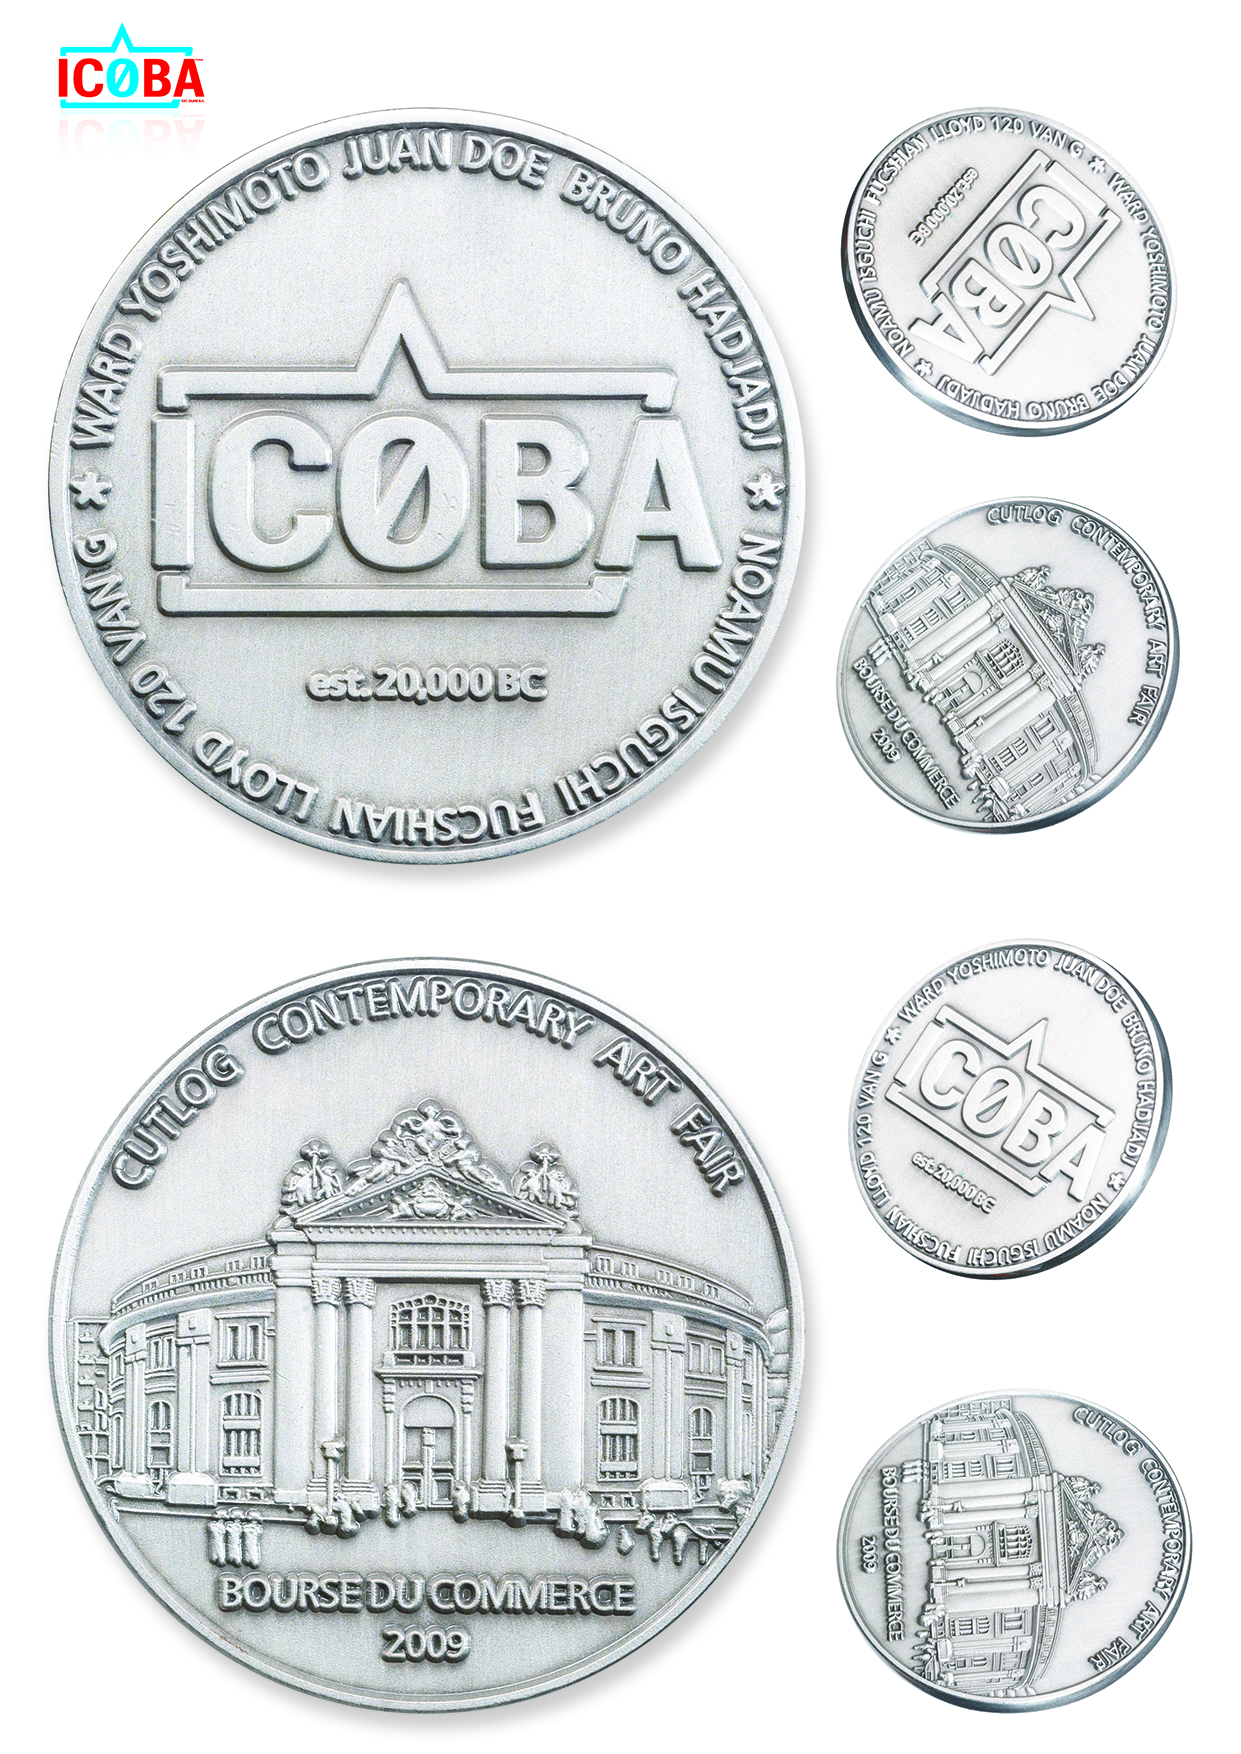 ICOBA_Catalogue_2010.jpg